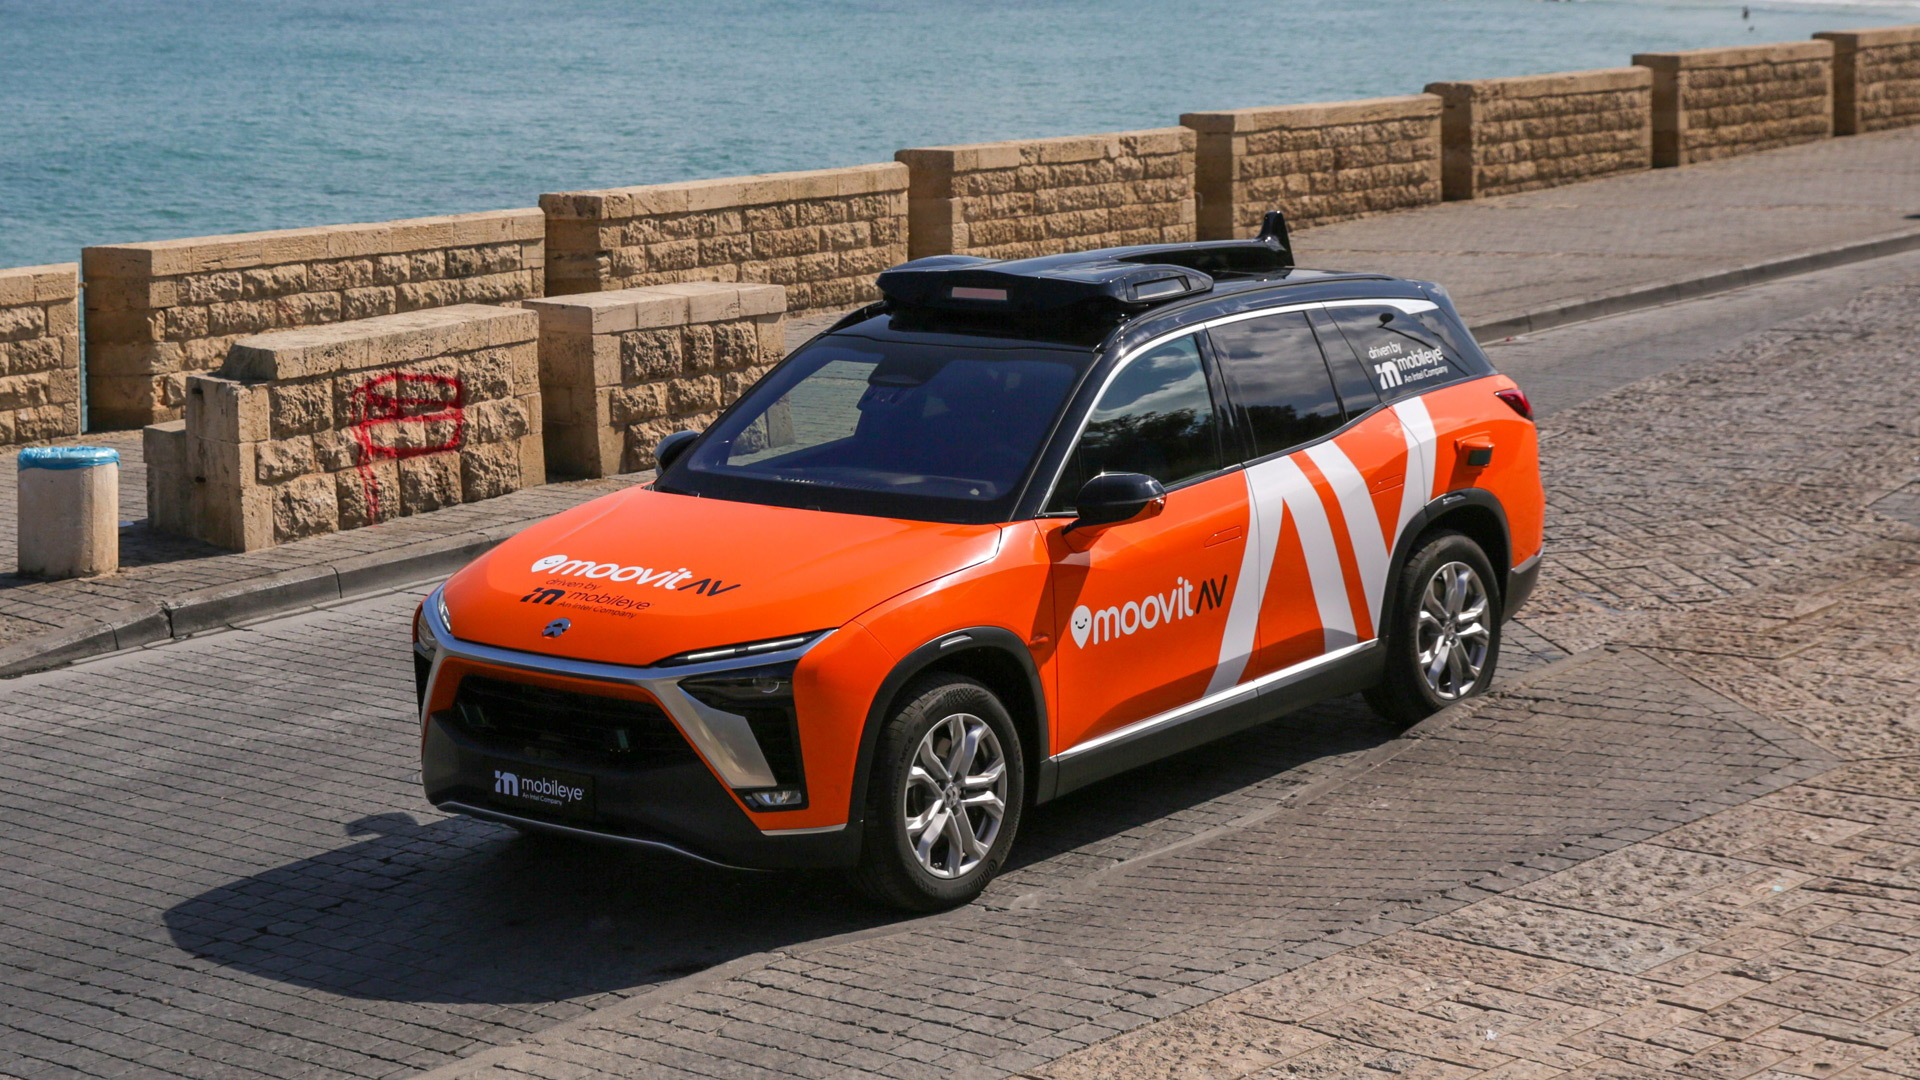 Mobileye self-driving taxi